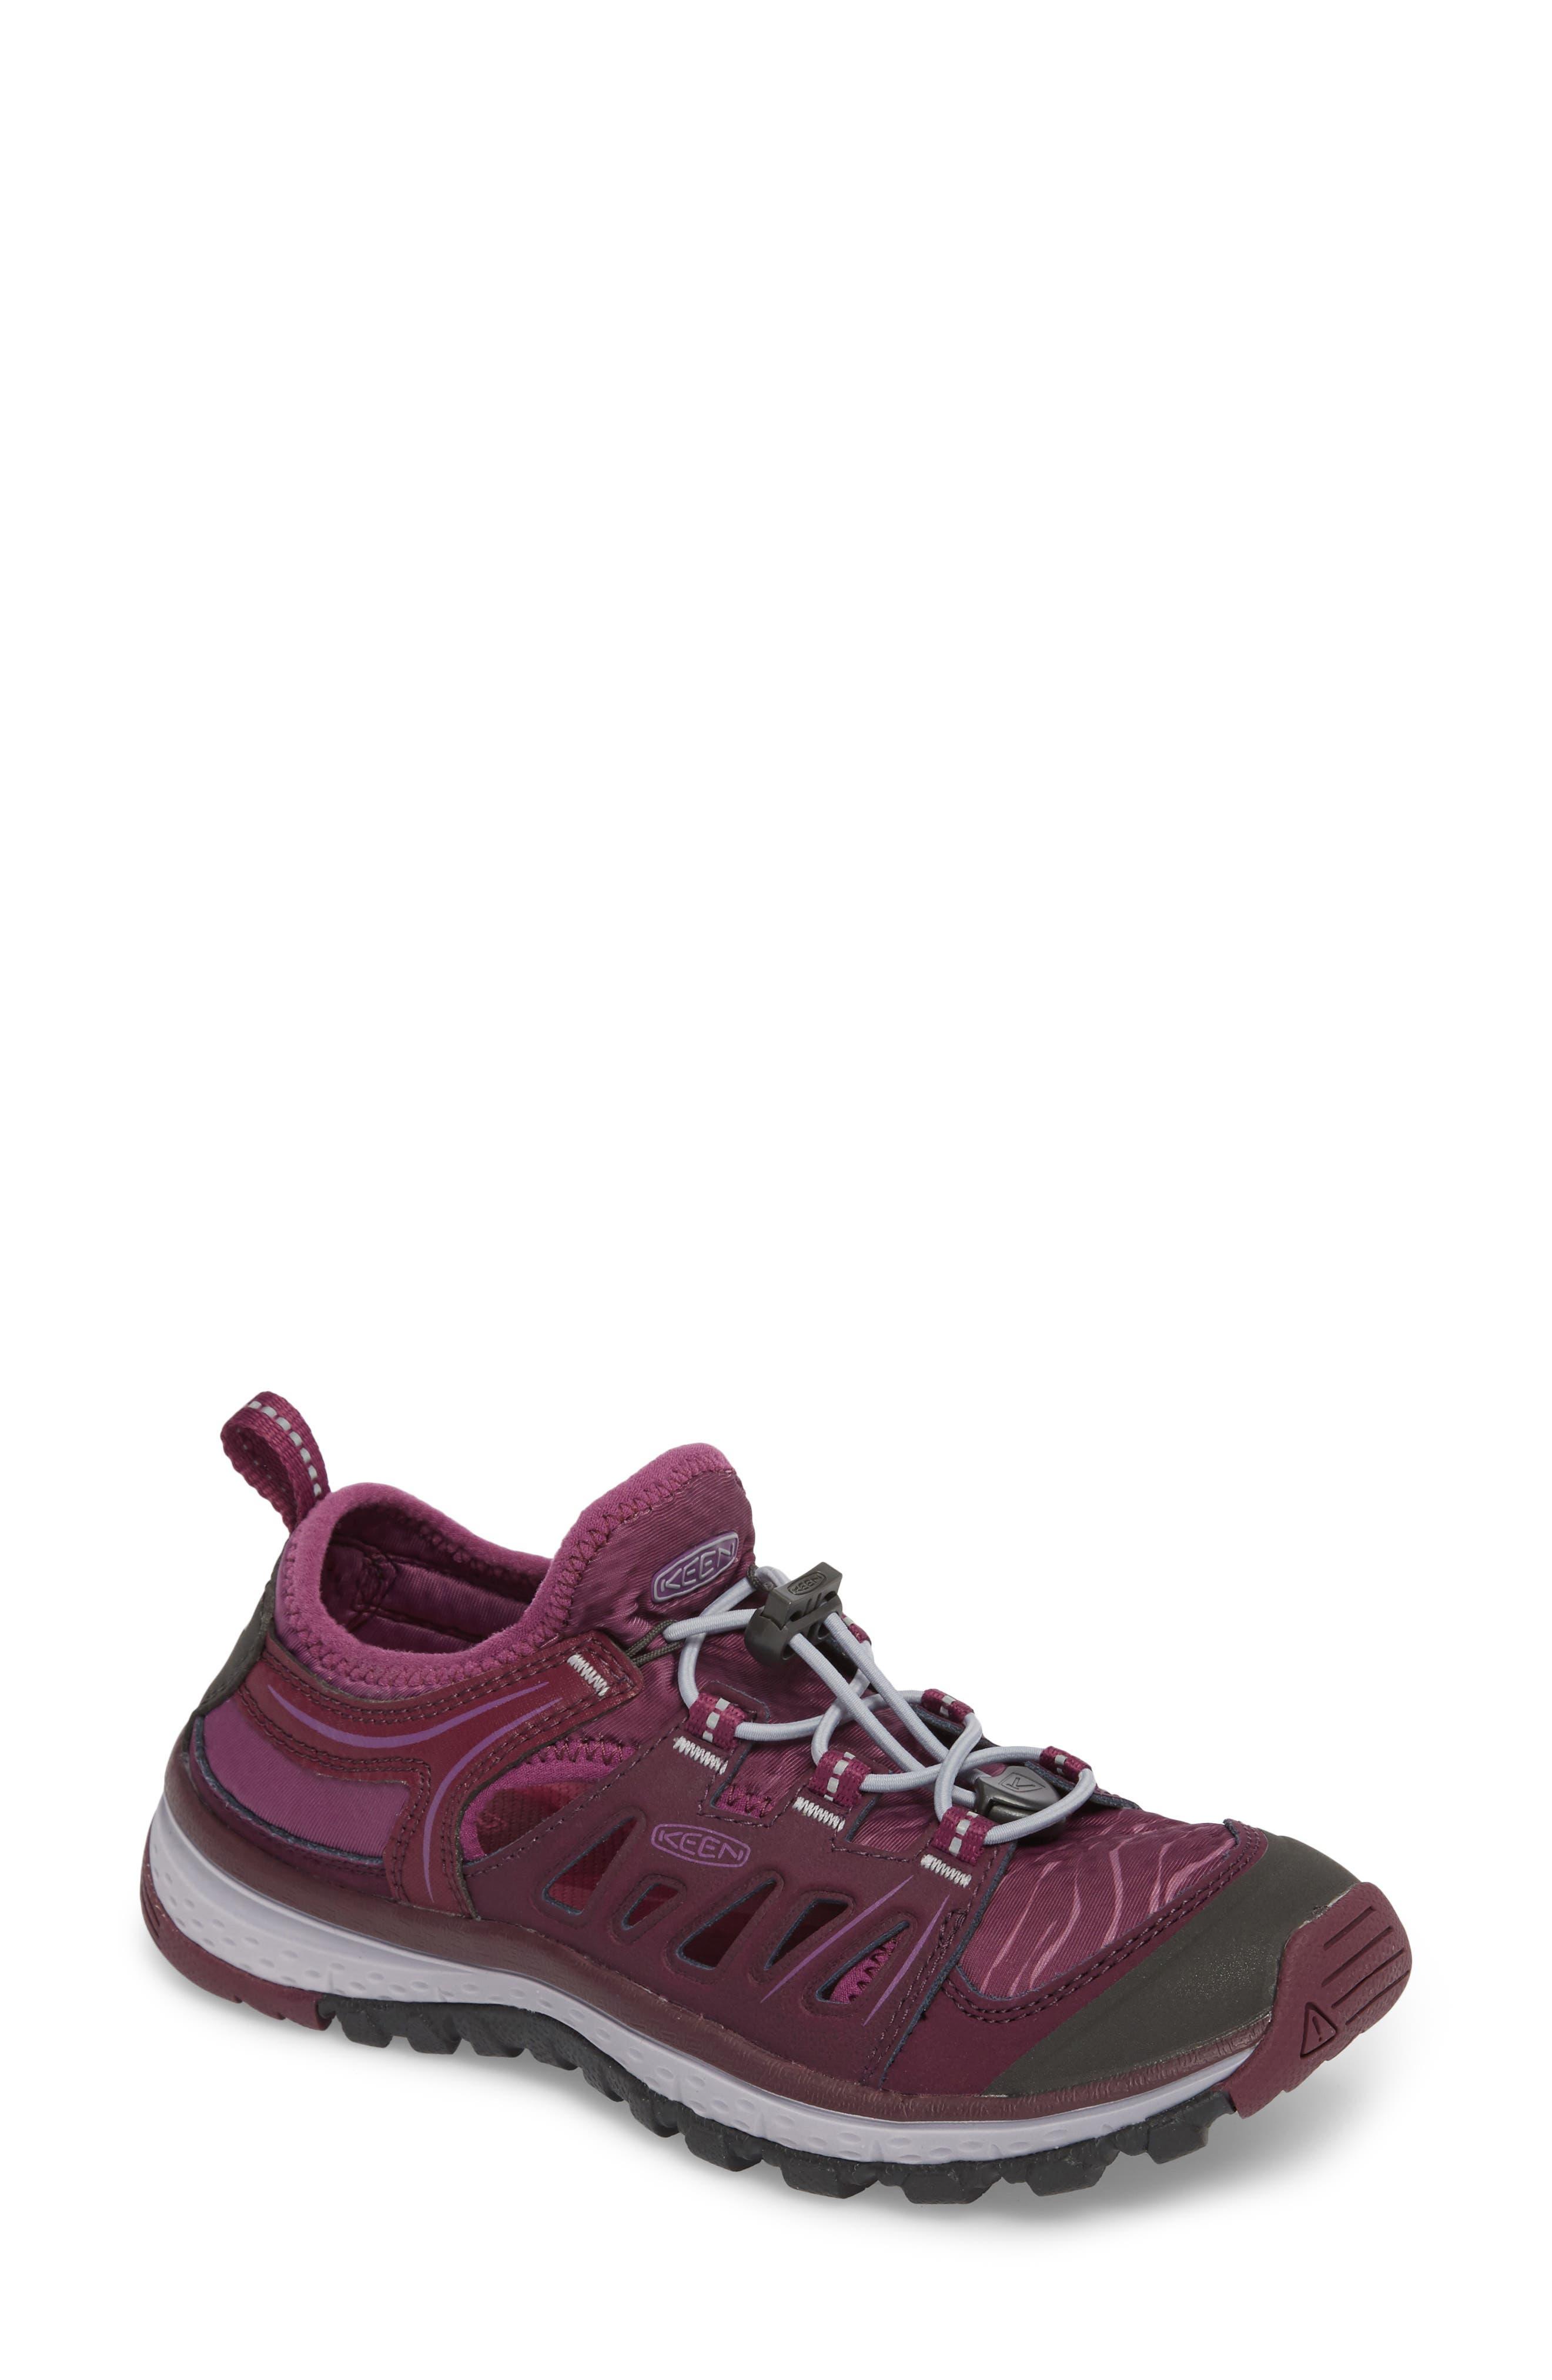 Terradora Ethos Hiking Sneaker,                         Main,                         color, Grape Wine/ Grape Kiss